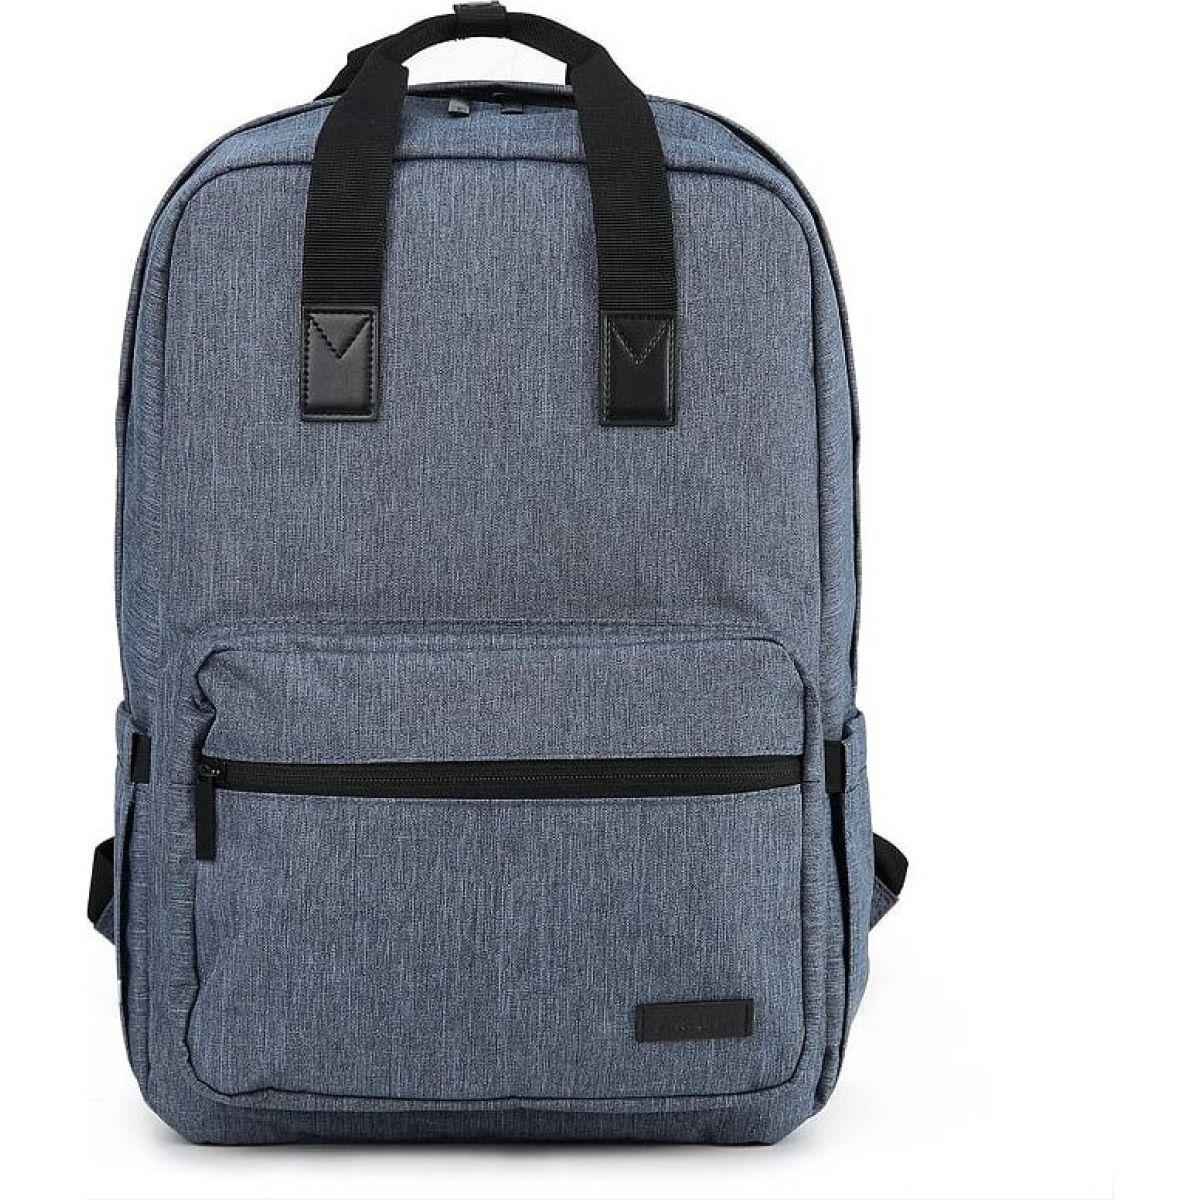 Ars Una Studentský batoh AU-8 modrý